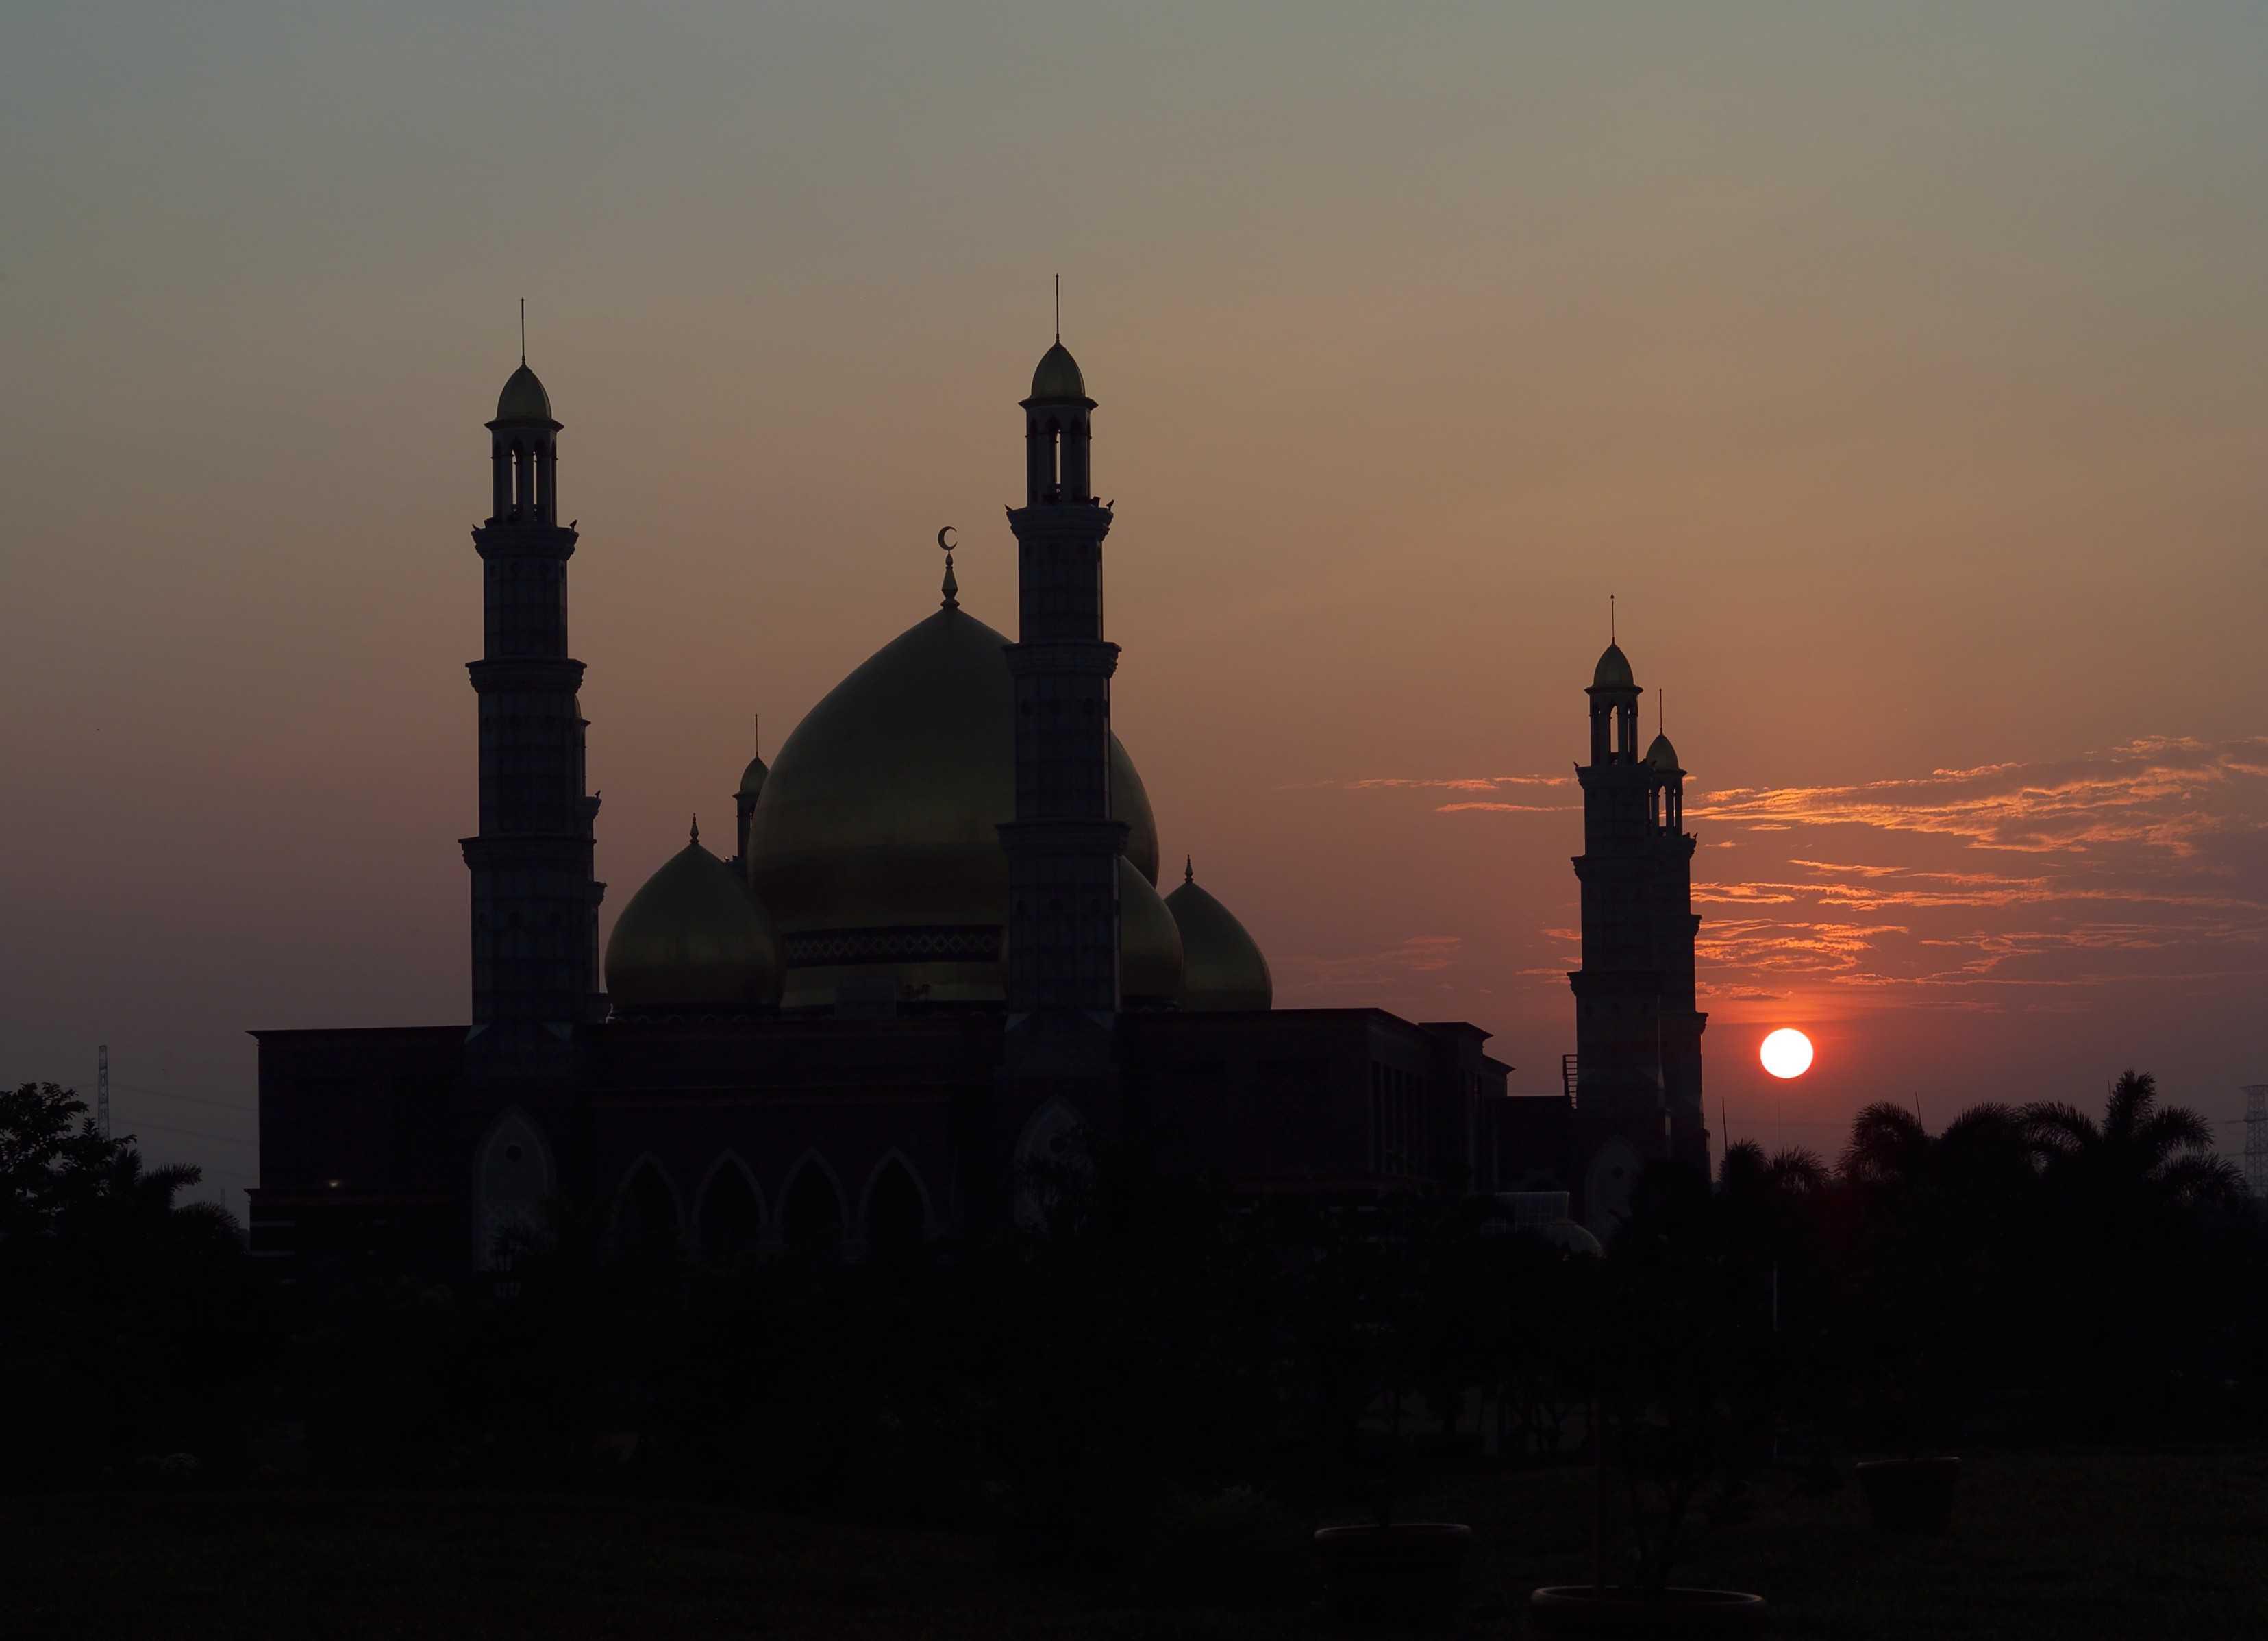 Pt. Garisprada Kubah Emas Mosque Meruyung, Limo, Depok City, West Java, Indonesia Depok Night View Klasik  22015